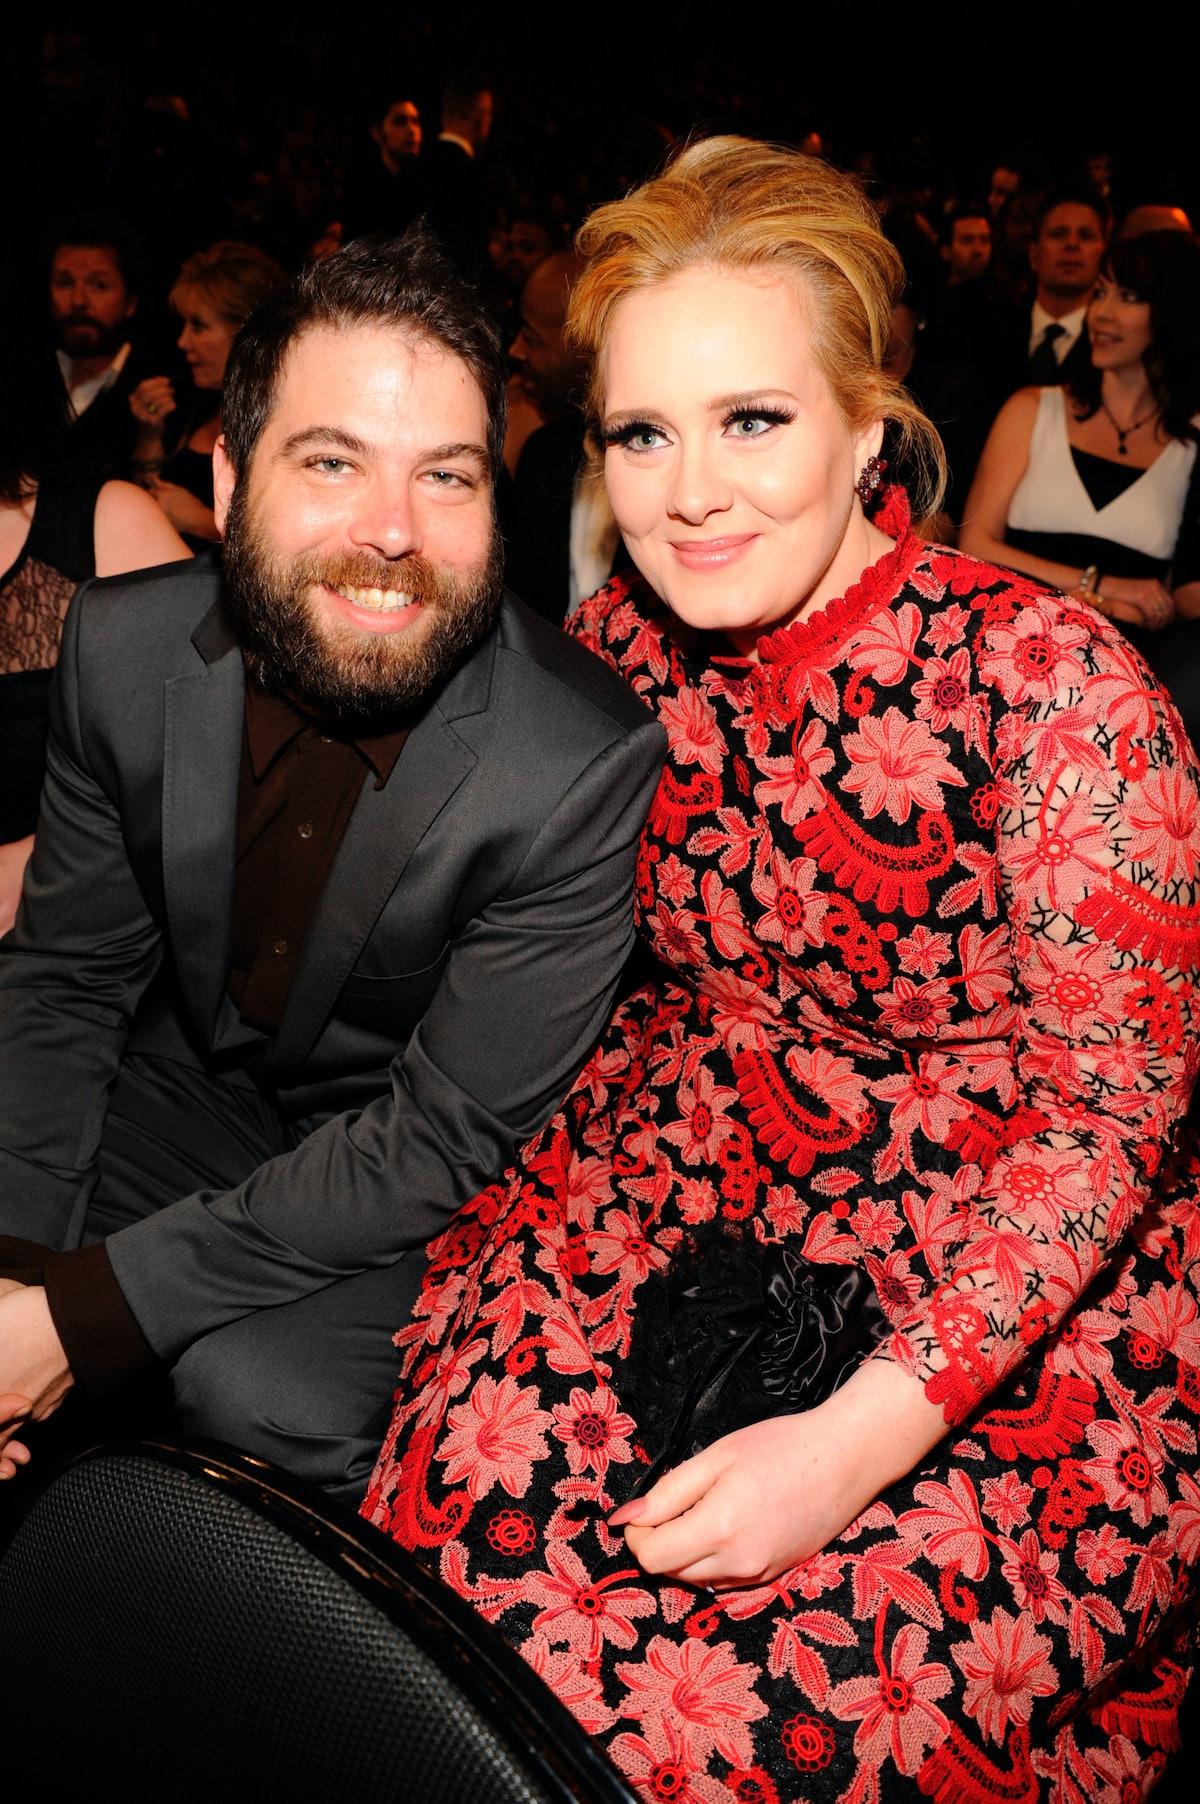 Adele and Simon Konecki were married.